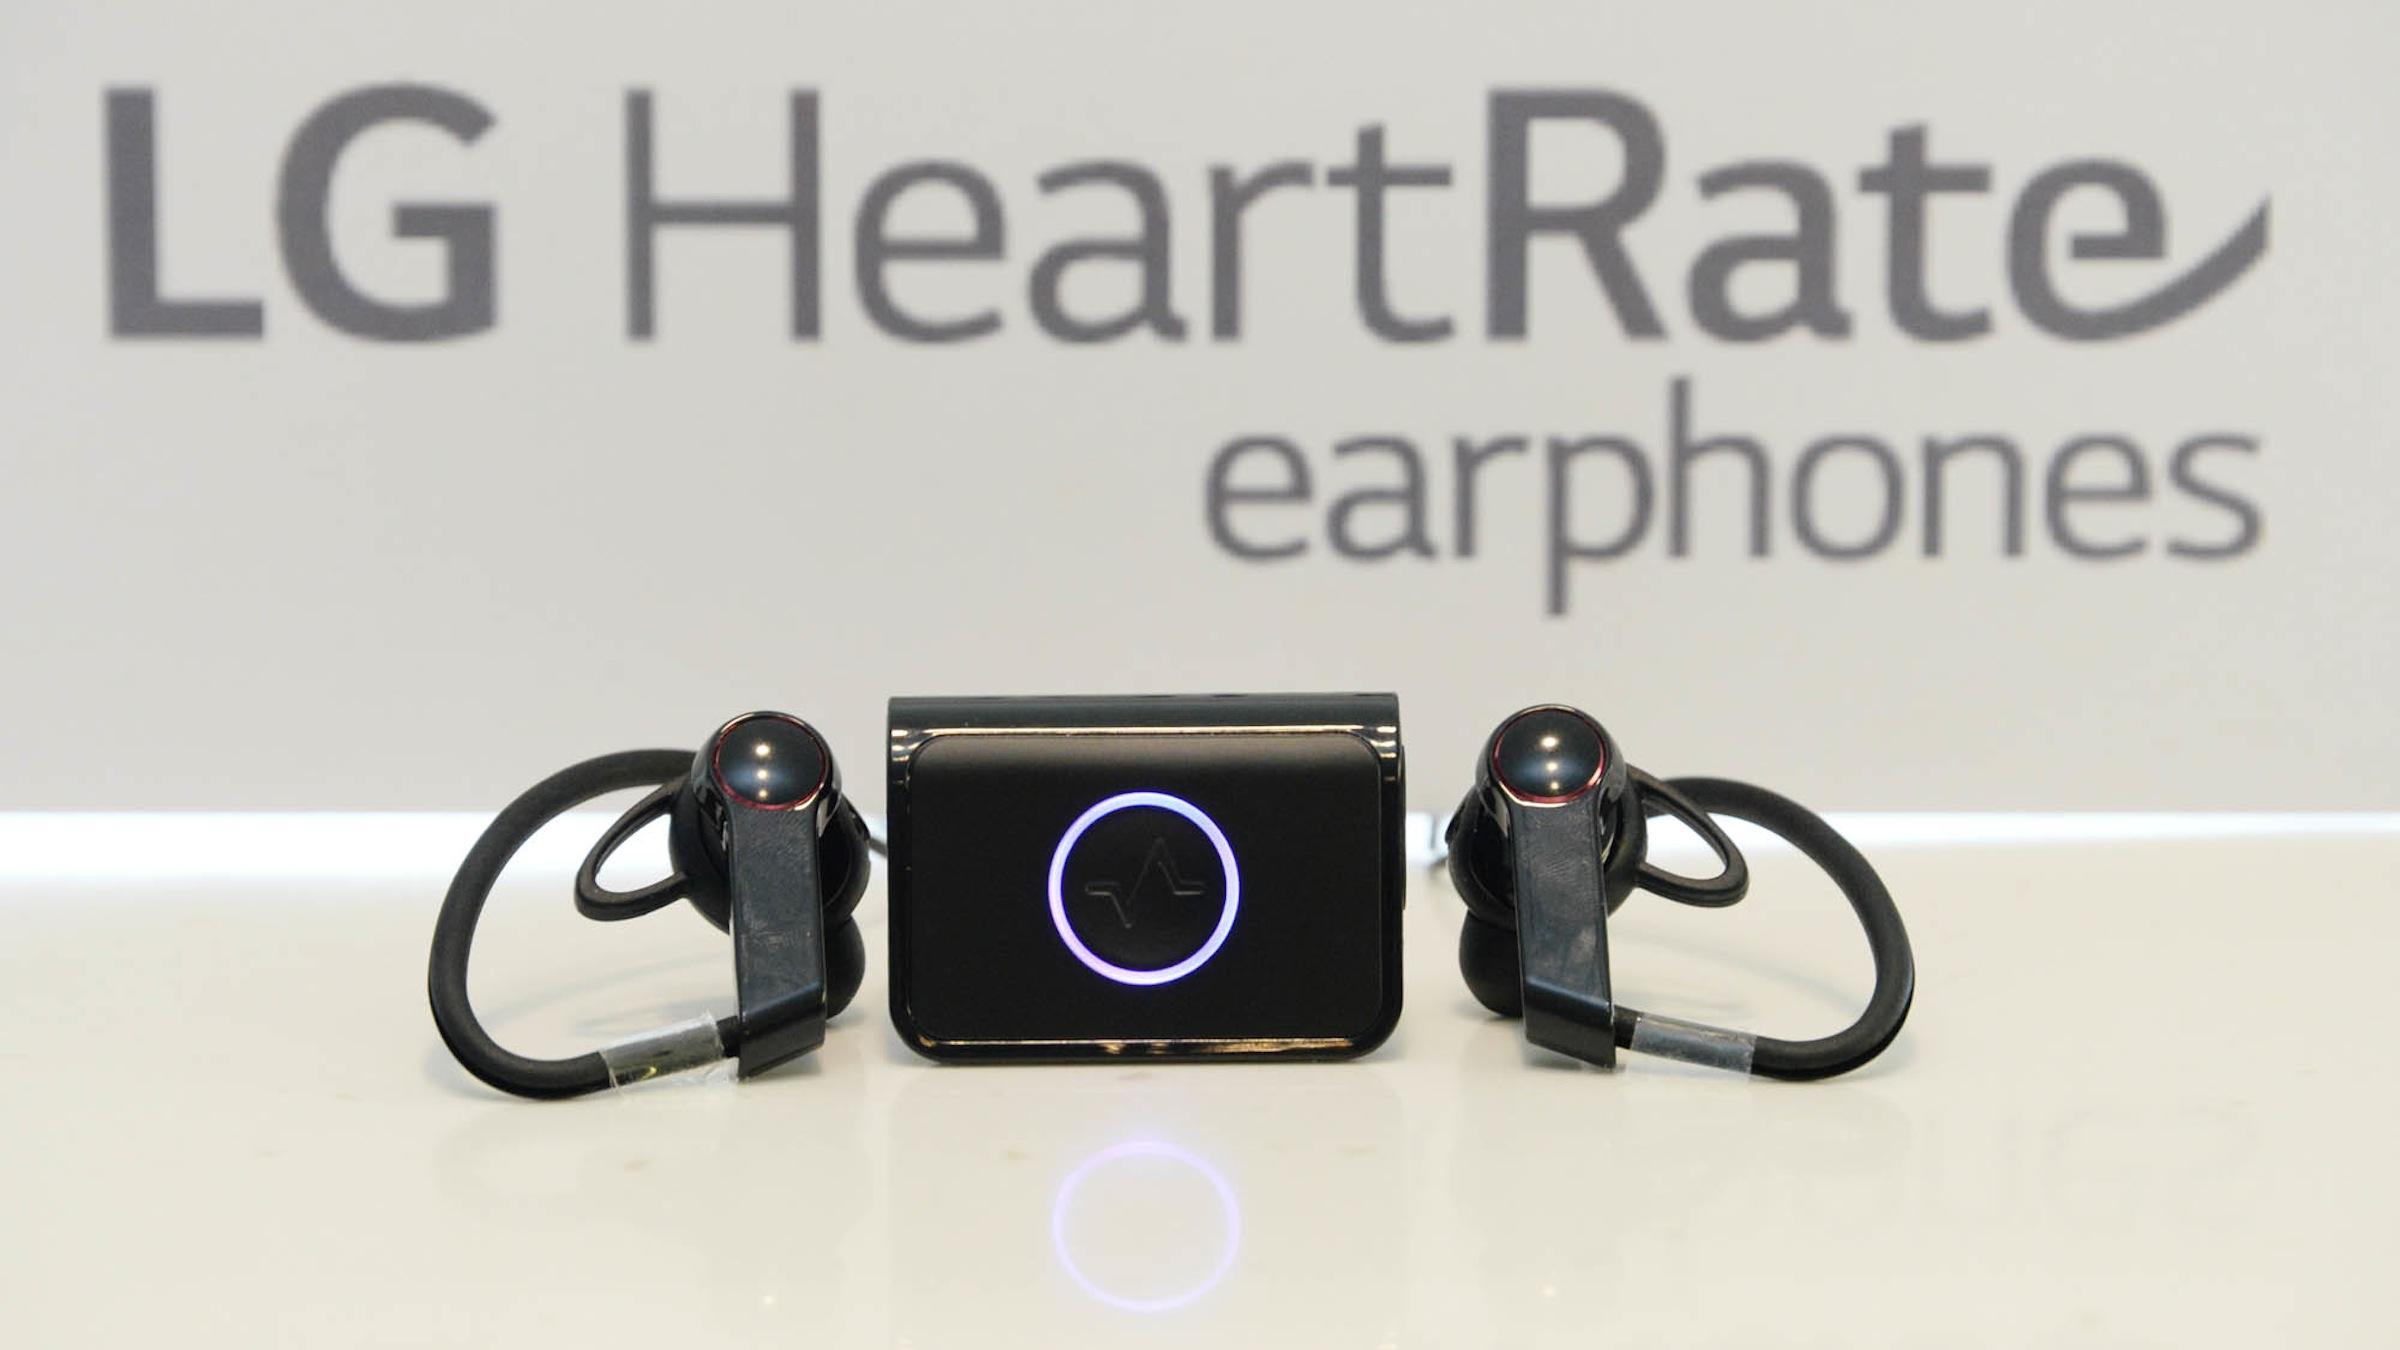 LG_Heart_Rate_Earphones